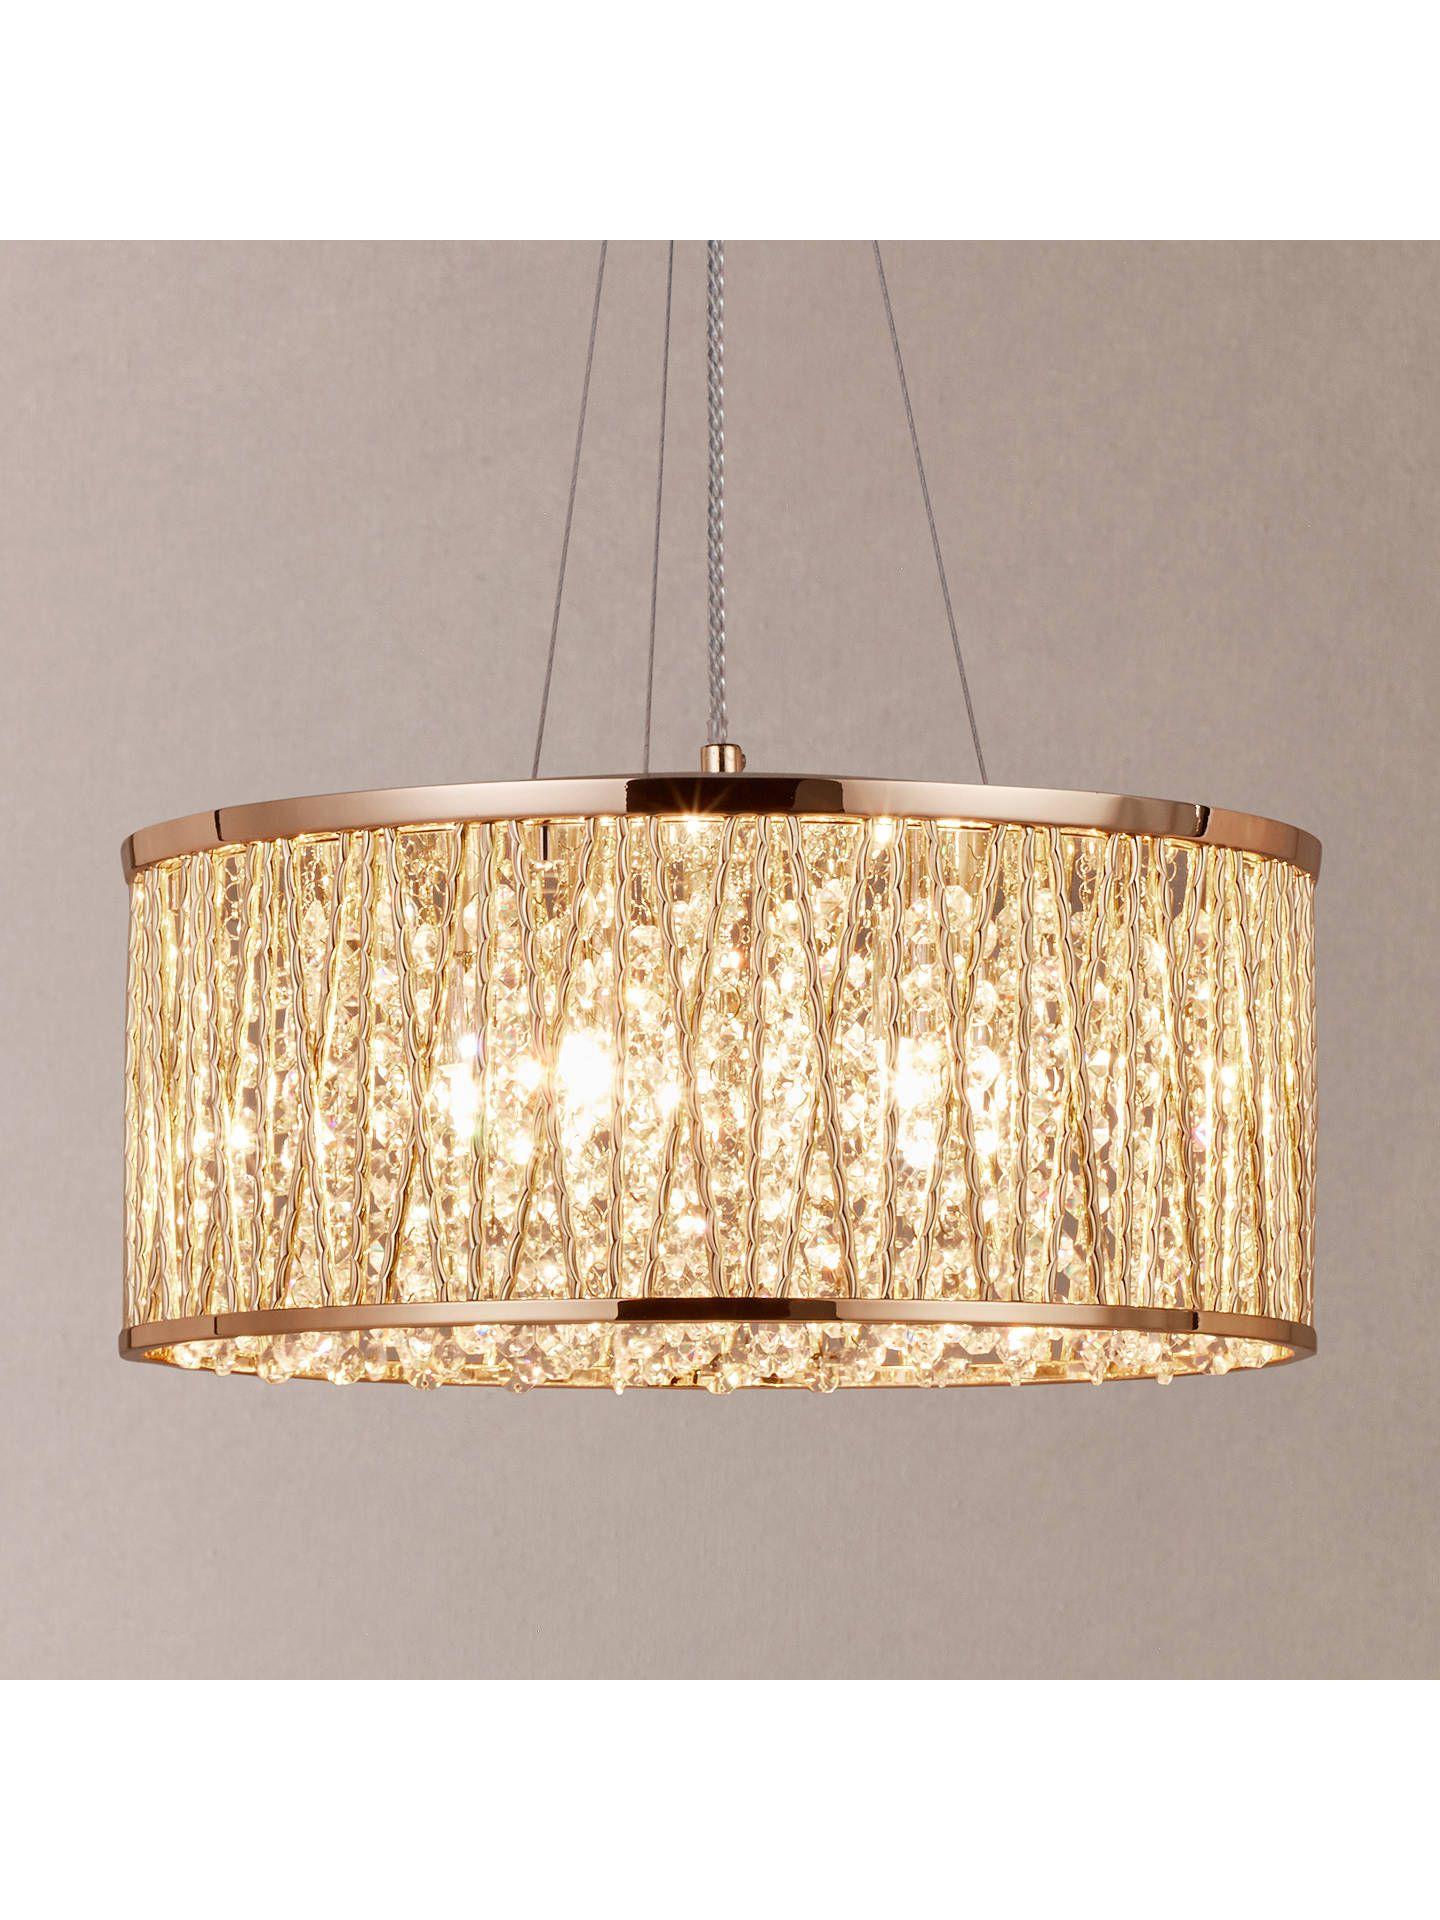 John Lewis Partners Emilia Large Crystal Ceiling Light Chrome Crystal Ceiling Light Ceiling Lights Gold Ceiling Light